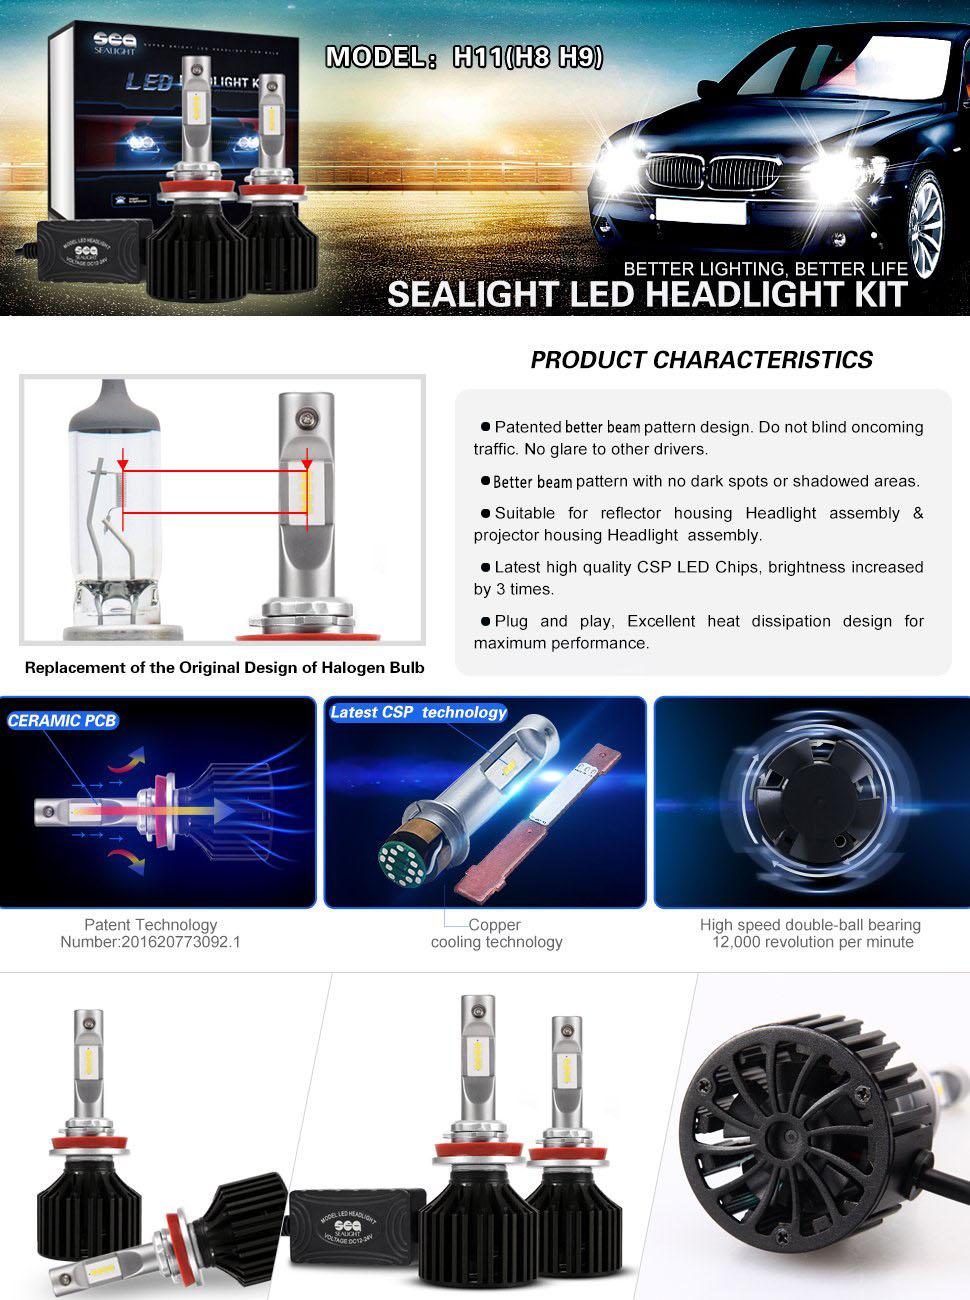 Led Headlight Bulbs H11 H8 H9 Conversion Kit Dot After Market Wiringheadlightmotorcyclepwhl22202101 Sealight X2 Series